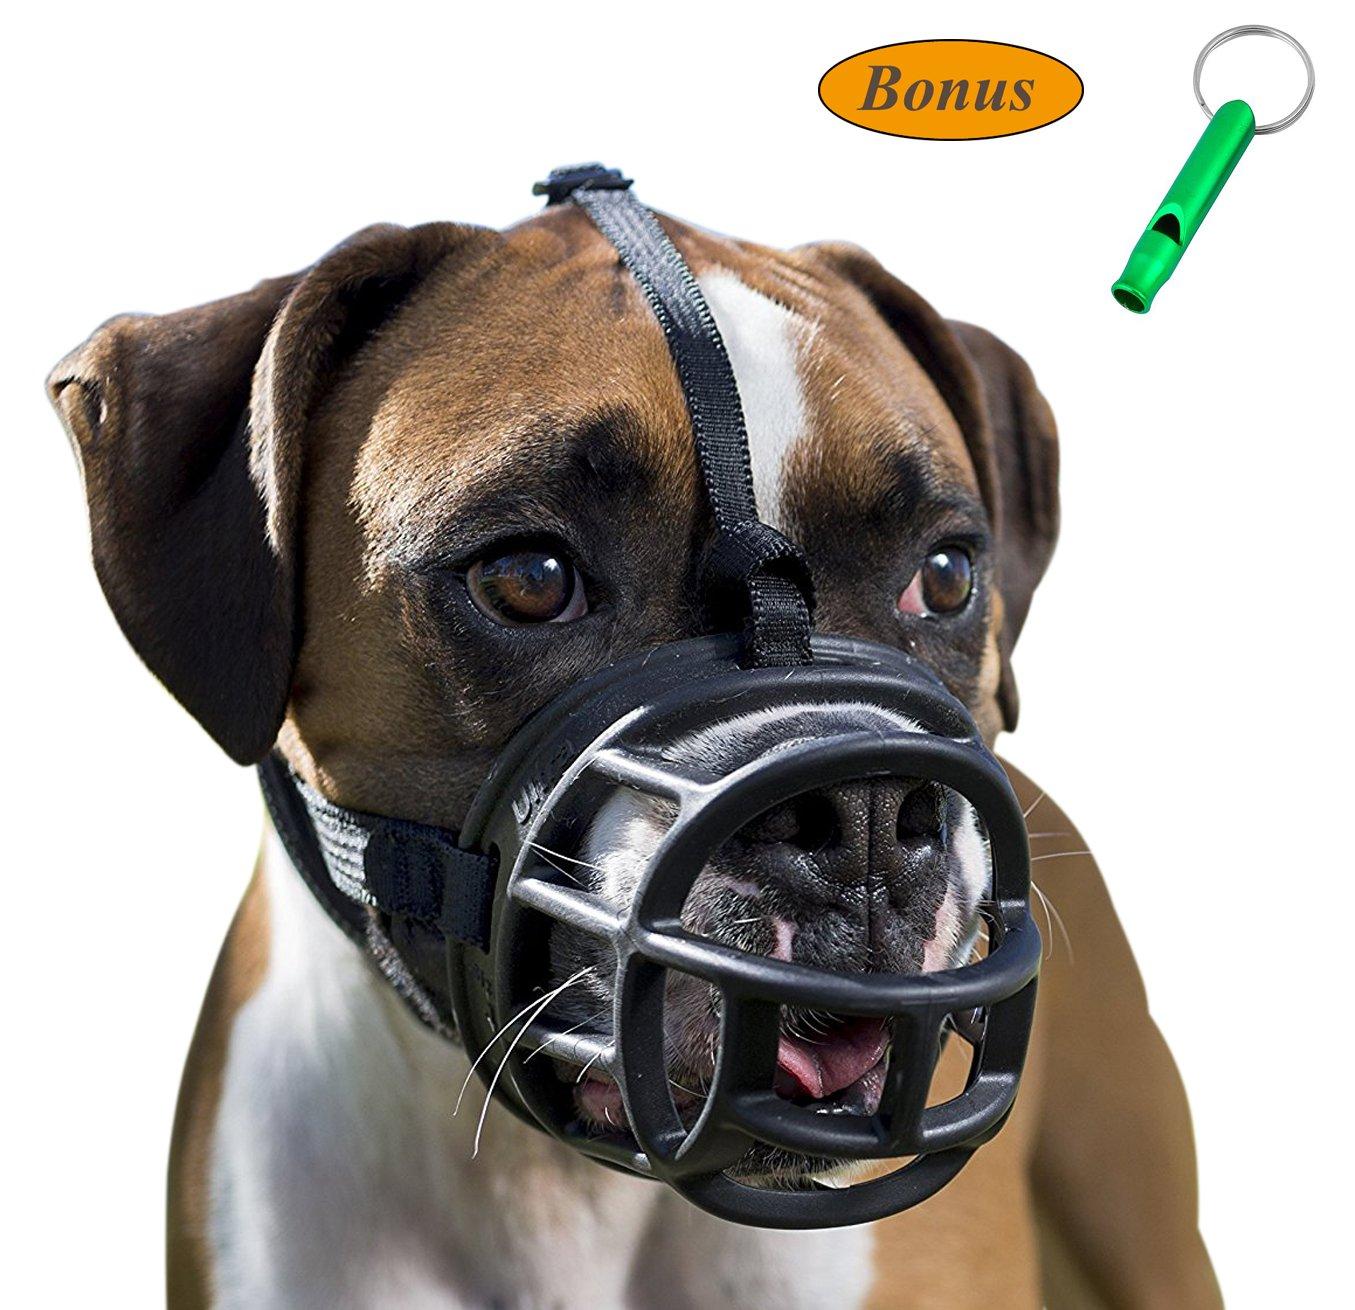 JeonbiuPet Pet Dog Muzzles, Dog Mouth Cover Soft Adjustable Breathable Silicone Dog Basket Muzzle for Training Biting Barking Chewing Panting (Size 4)